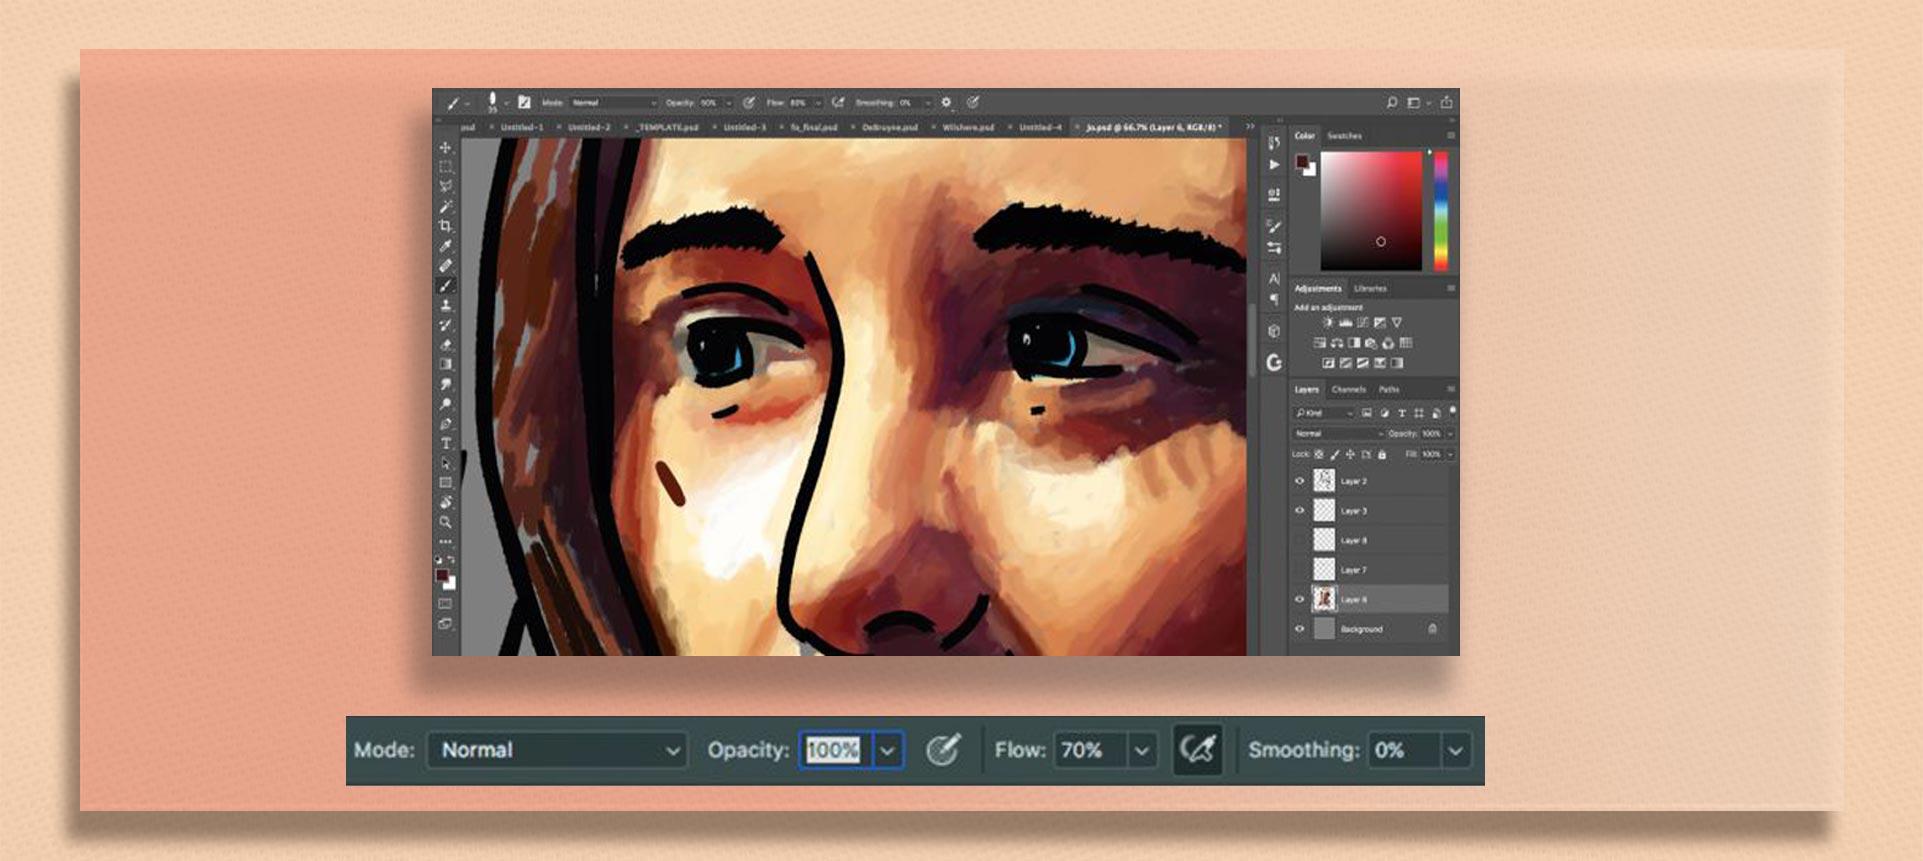 brush tool  photoshop6 - چگونه از ابزار براش در فتوشاپ استفاده کنیم